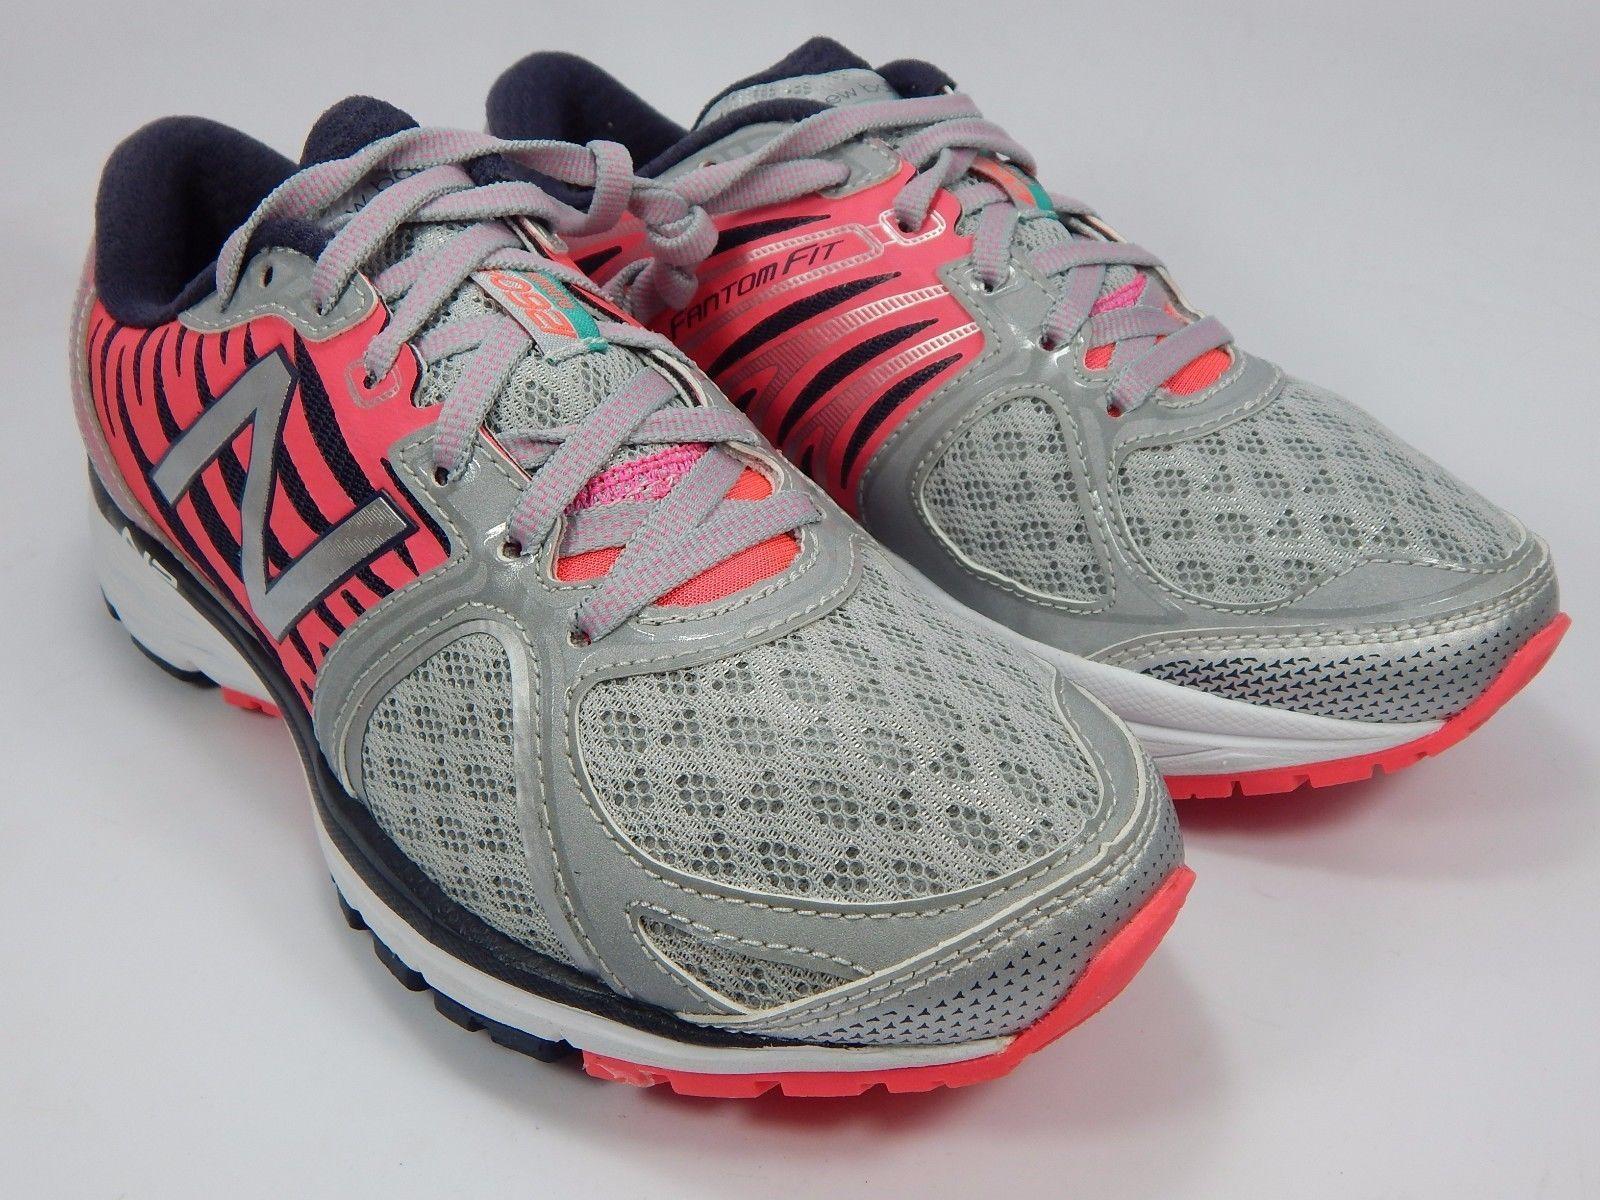 New Balance 1260 v5 Women's Running Shoes Sz US 6 M (B) EU 36.5 Silver W1260SP5